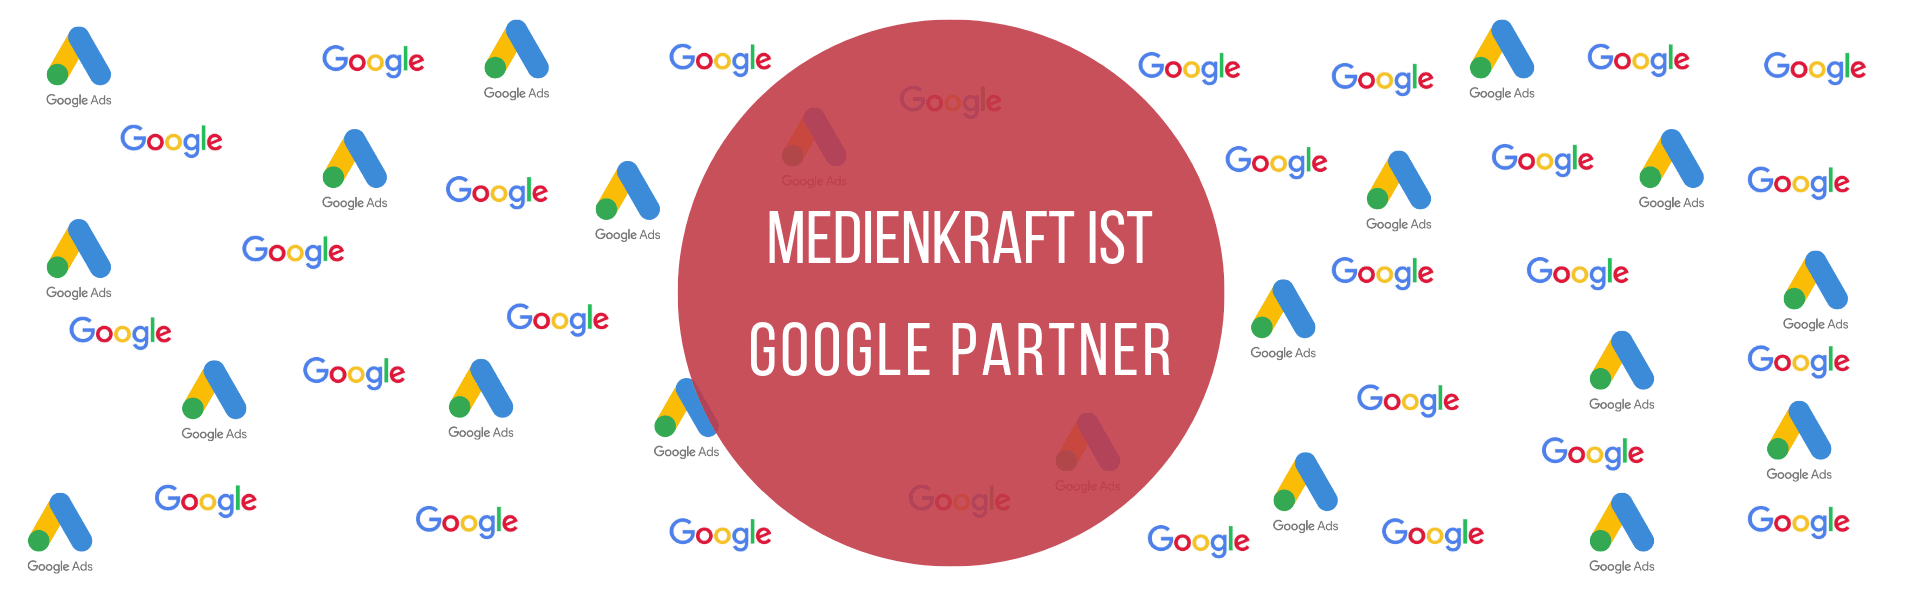 Medienkraft ist zertifizierter Google Partner